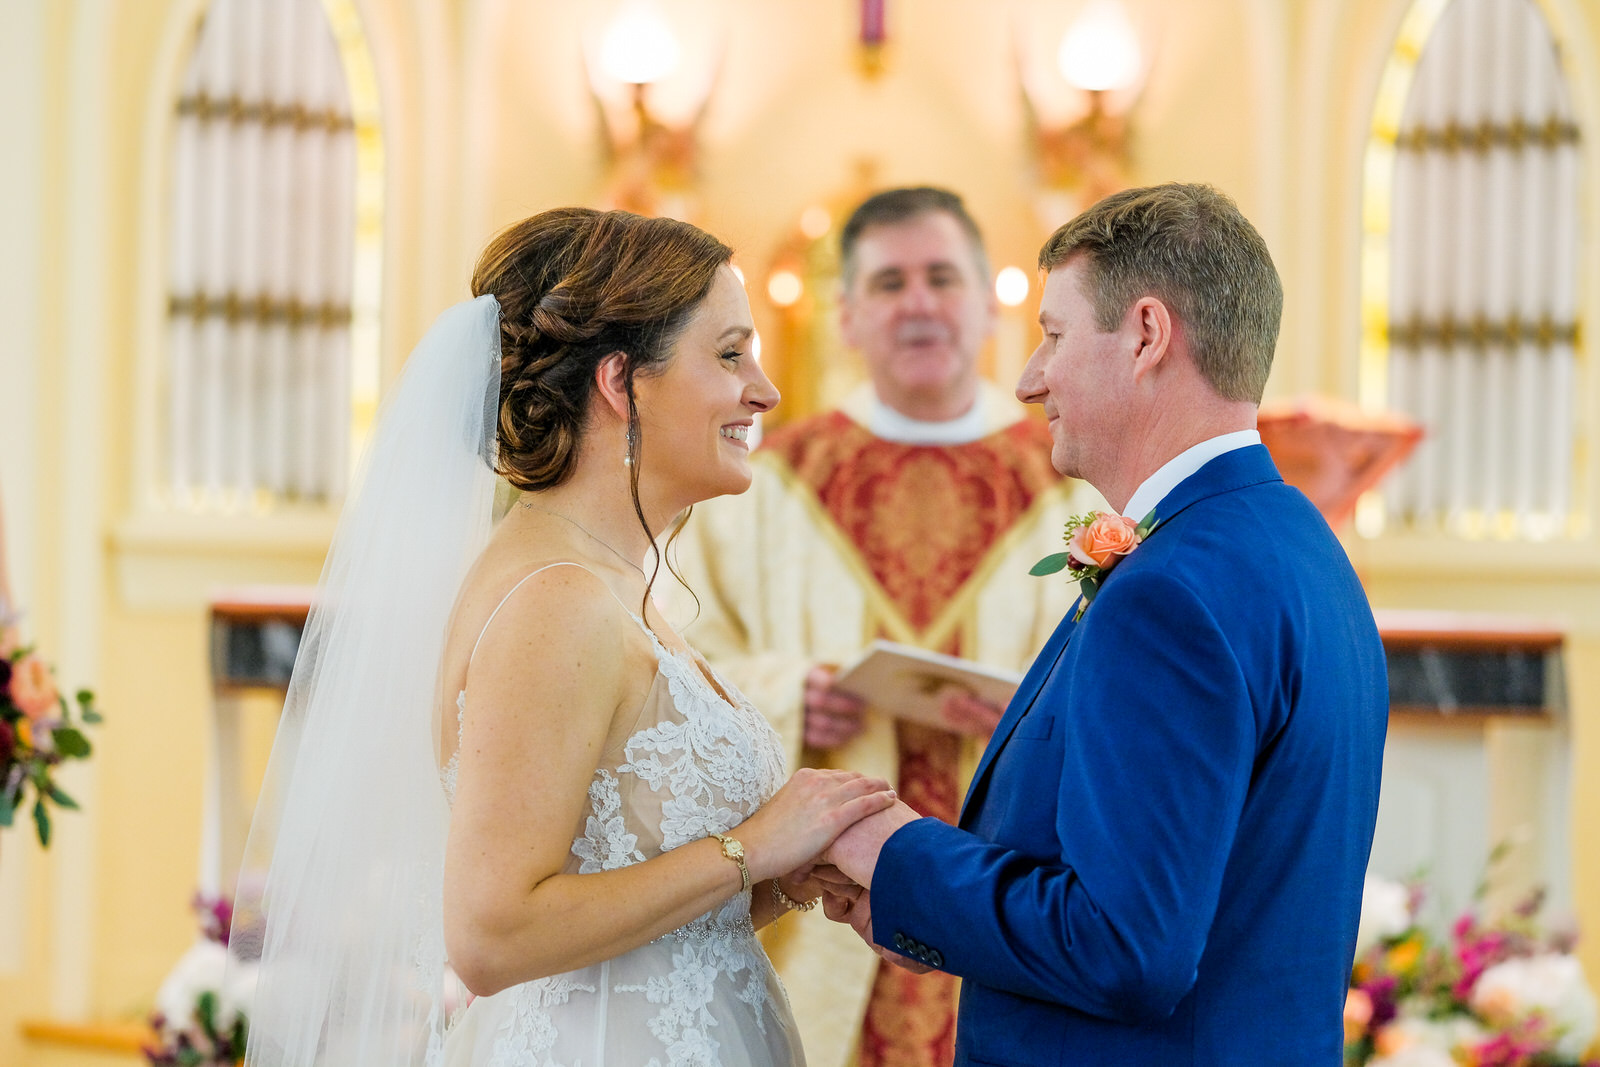 Zorvino-Vineyards-Fall-Wedding-Photography-358.jpg